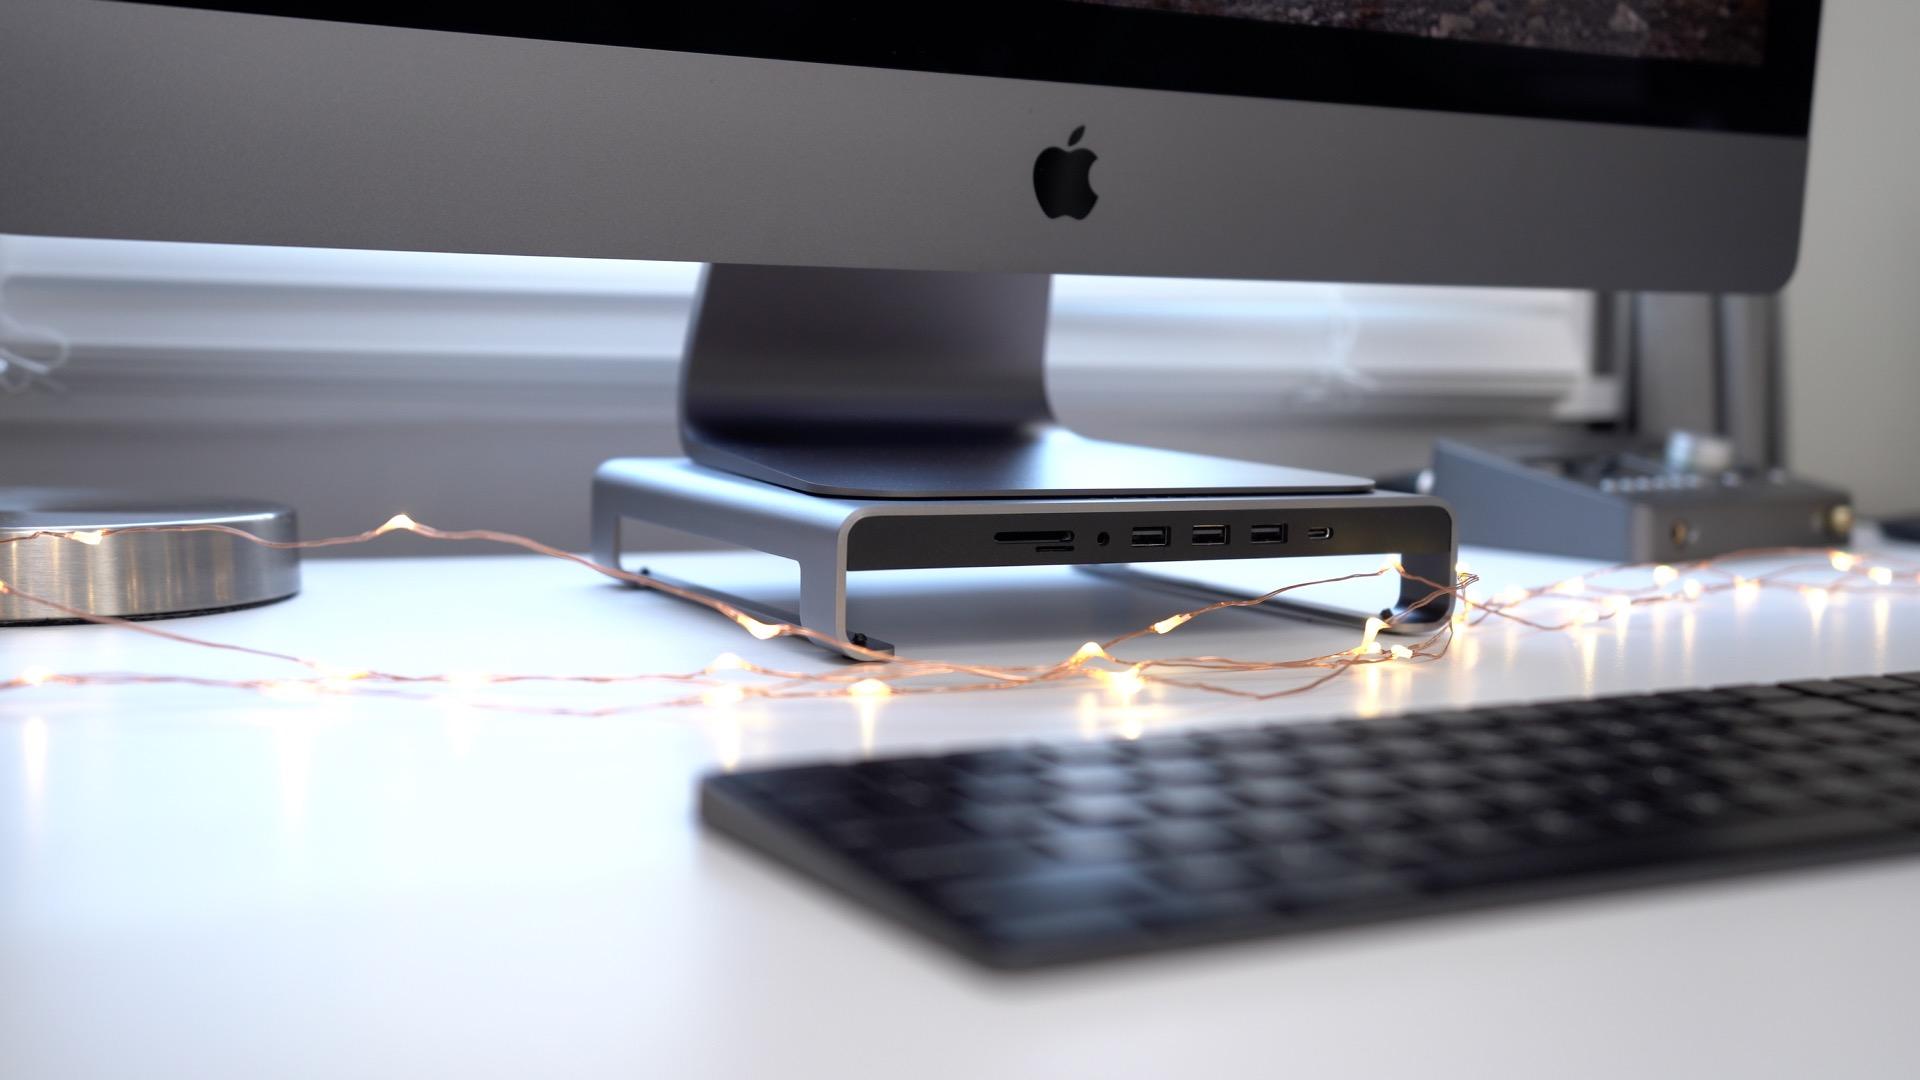 Satechi Aluminum Stand Hub for iMac